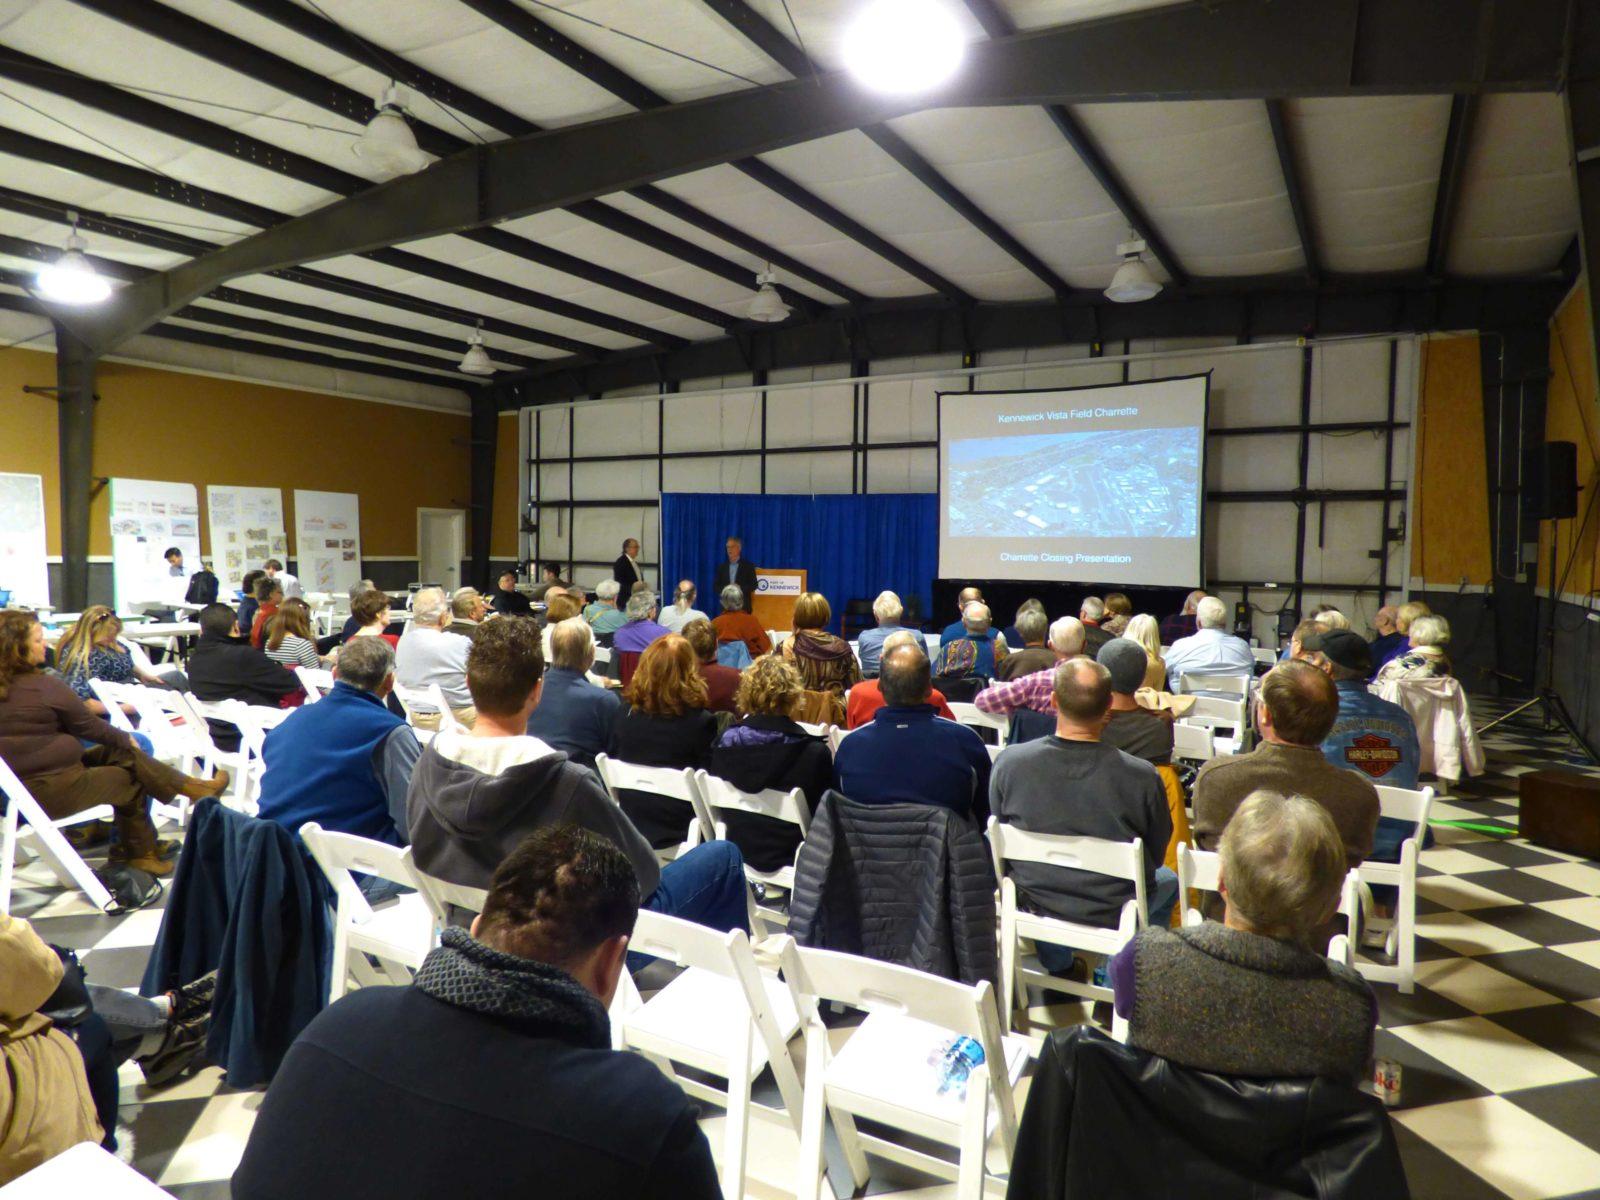 PowerPoint presentation to crowd at Vista Field Charrette.